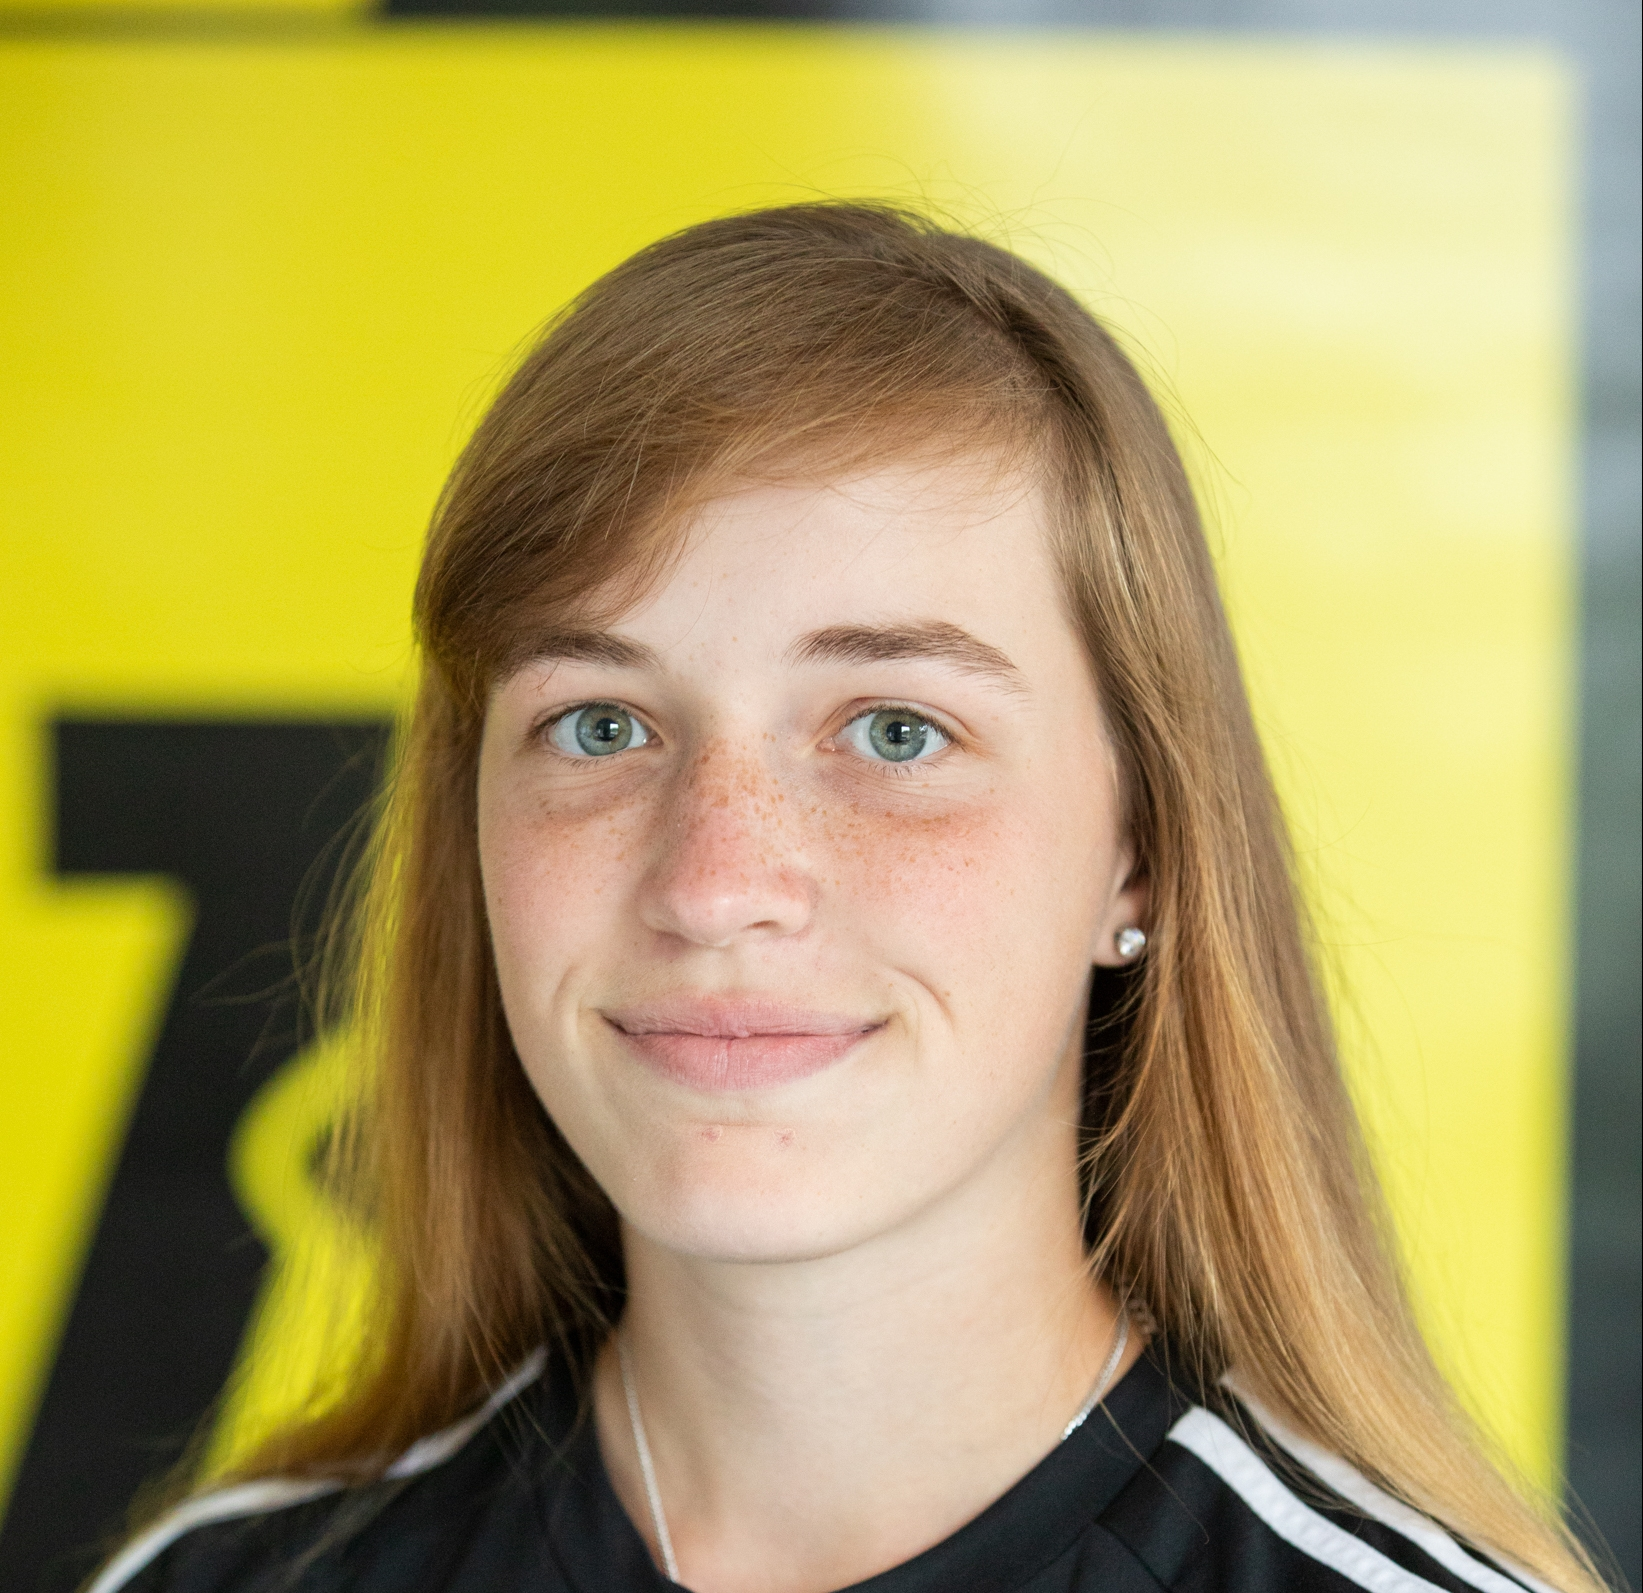 Laura Birkel